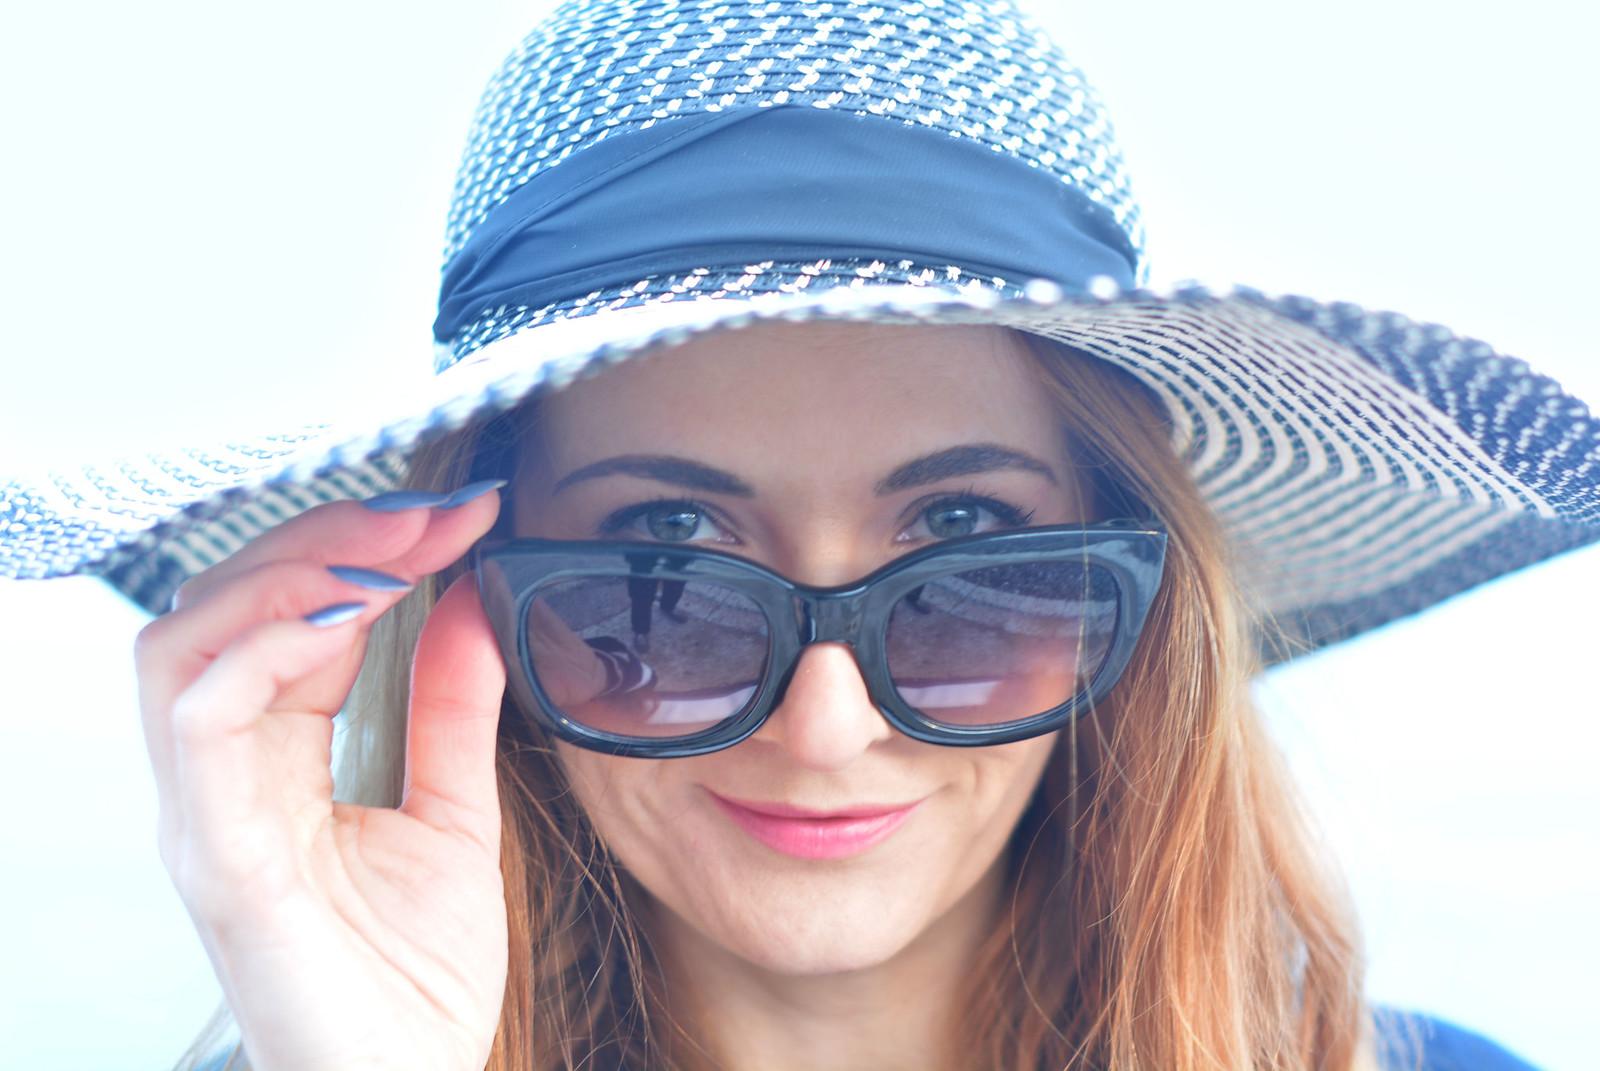 Nautical style: Navy blue and white floppy hat, cat eye sunglasses